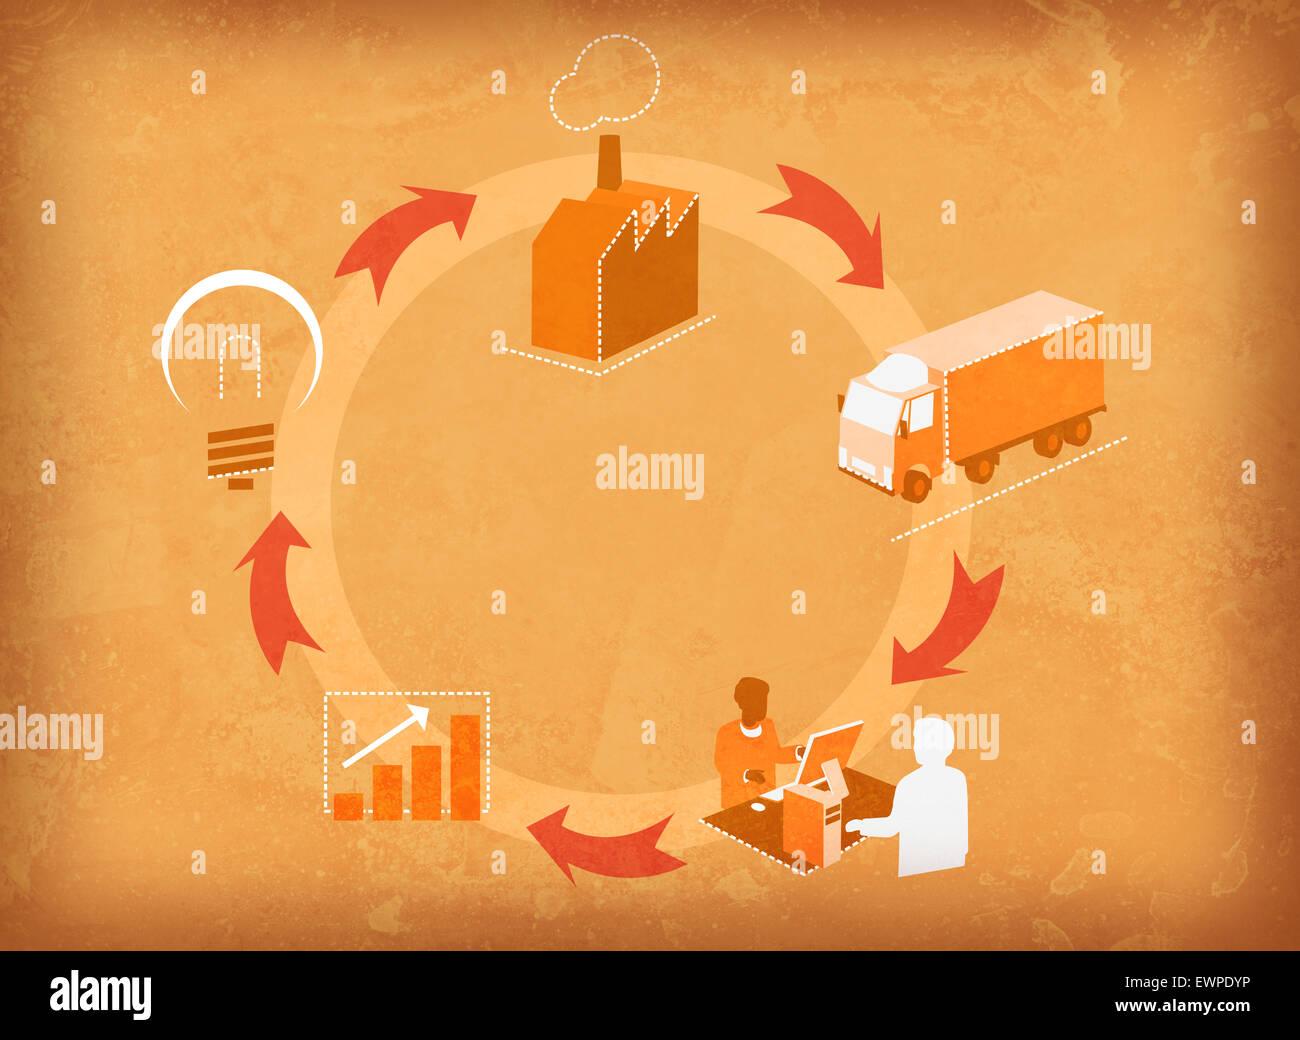 Business-Prozess-Zyklus Stockbild